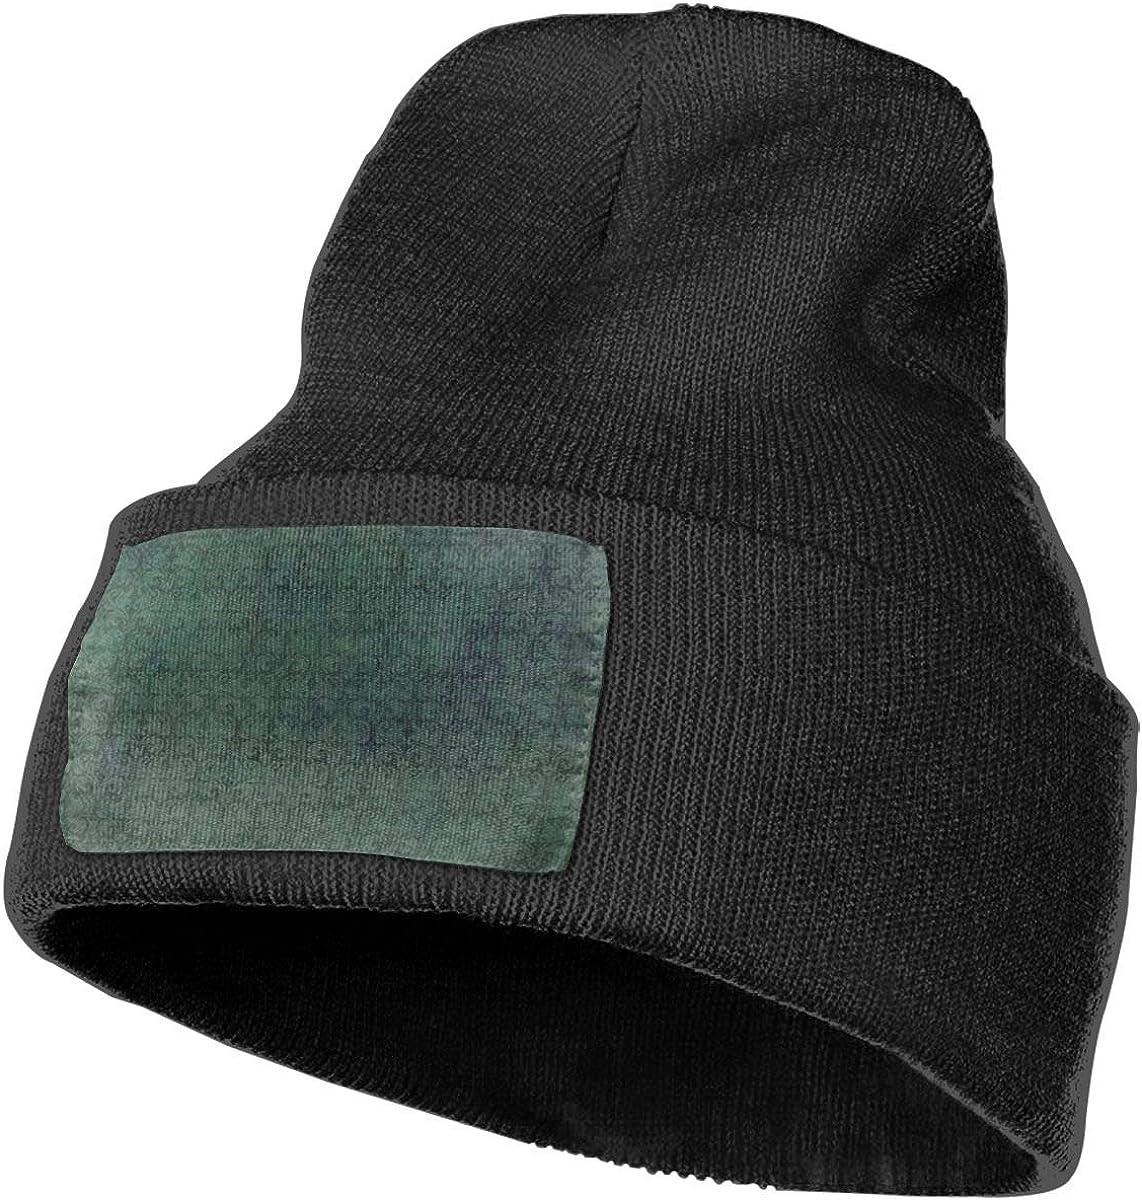 ONHIM Mysterious Men /& Women Stretchy Knit Beanie Hat Slouchy Headwear Cap